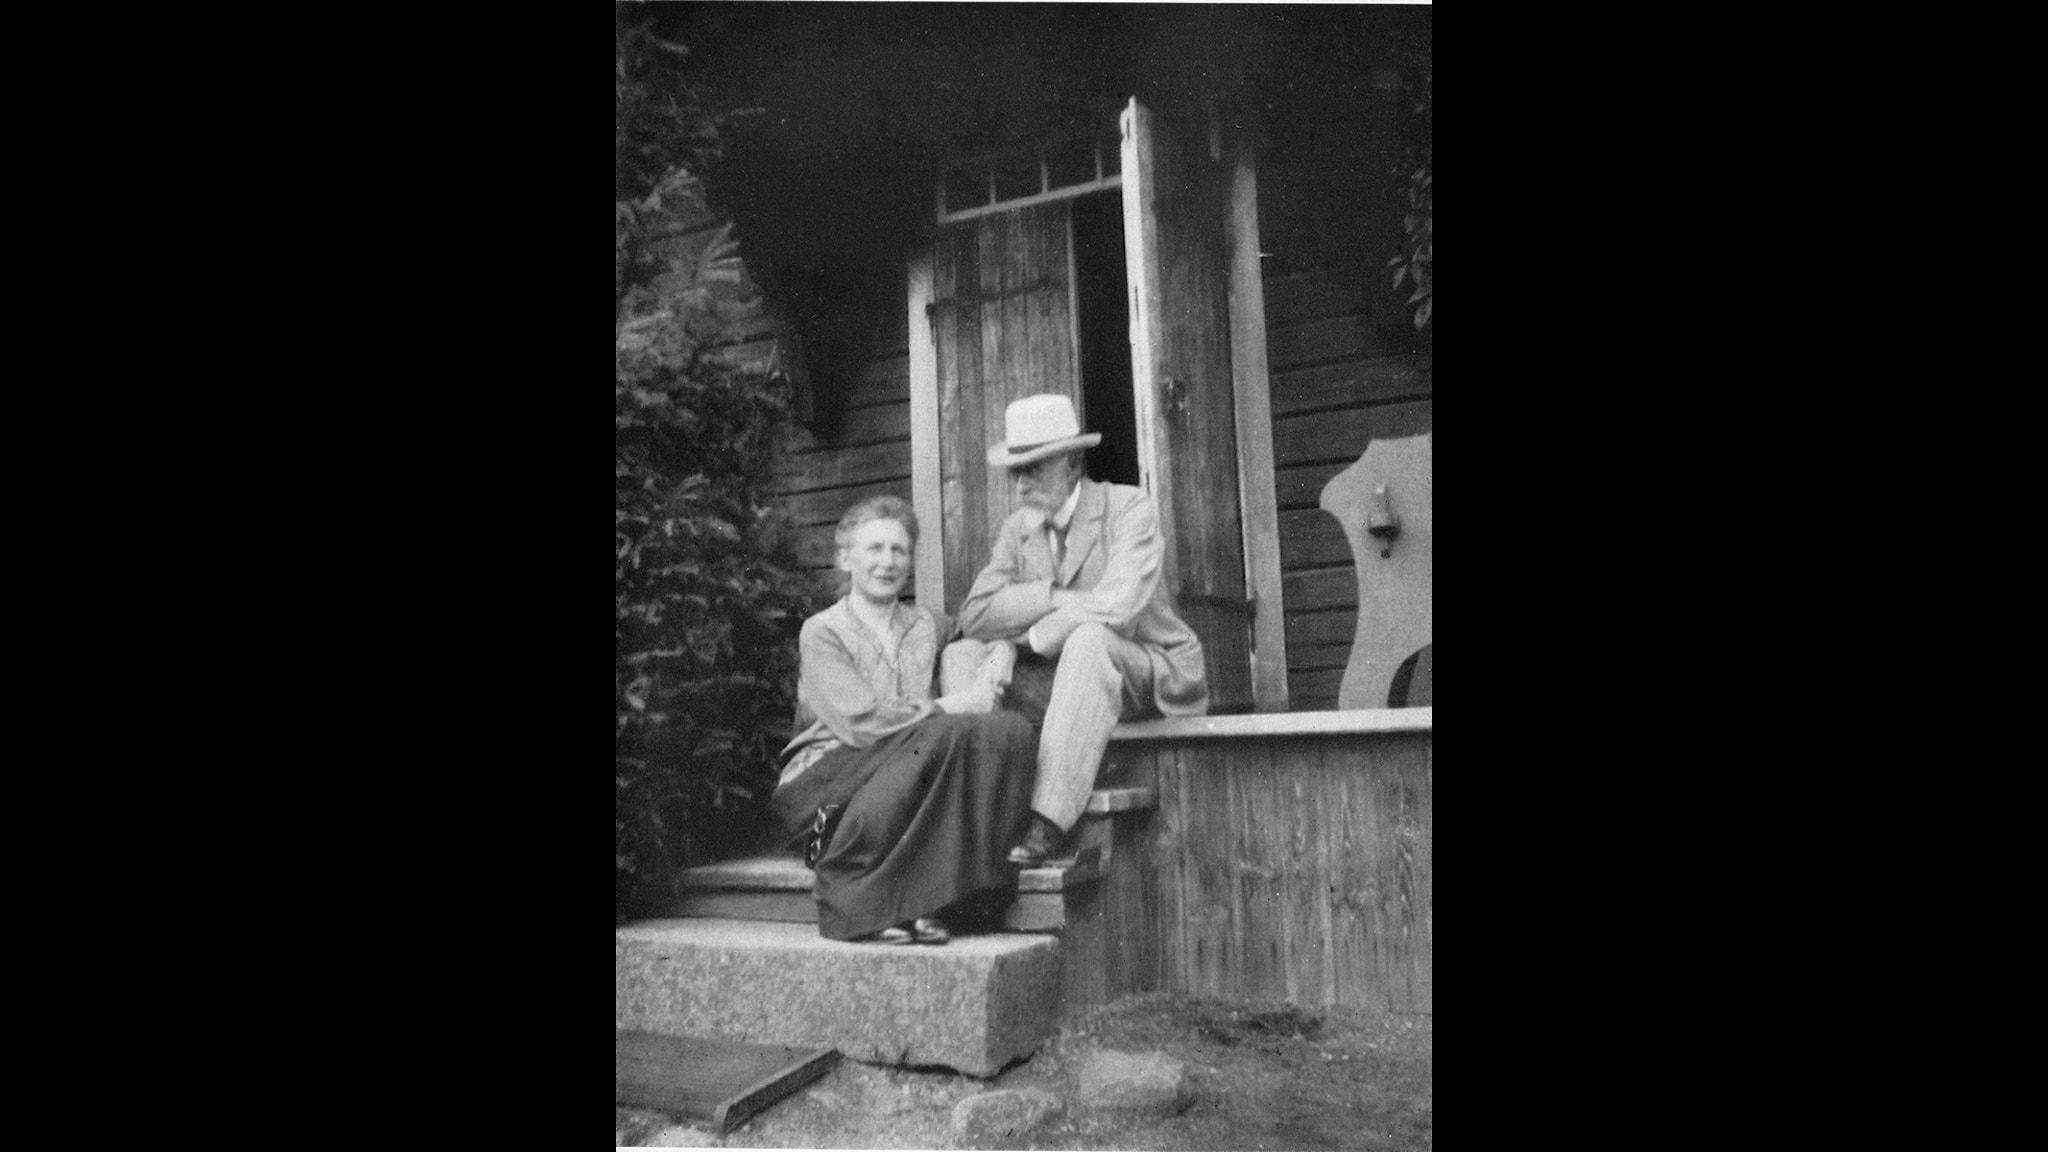 Alice och Jacob Tegnér vid sommarhuset Sola utanför Eksjö (Ur Stina Palmborgs bok Alice Tegnér, Natur&Kultur)